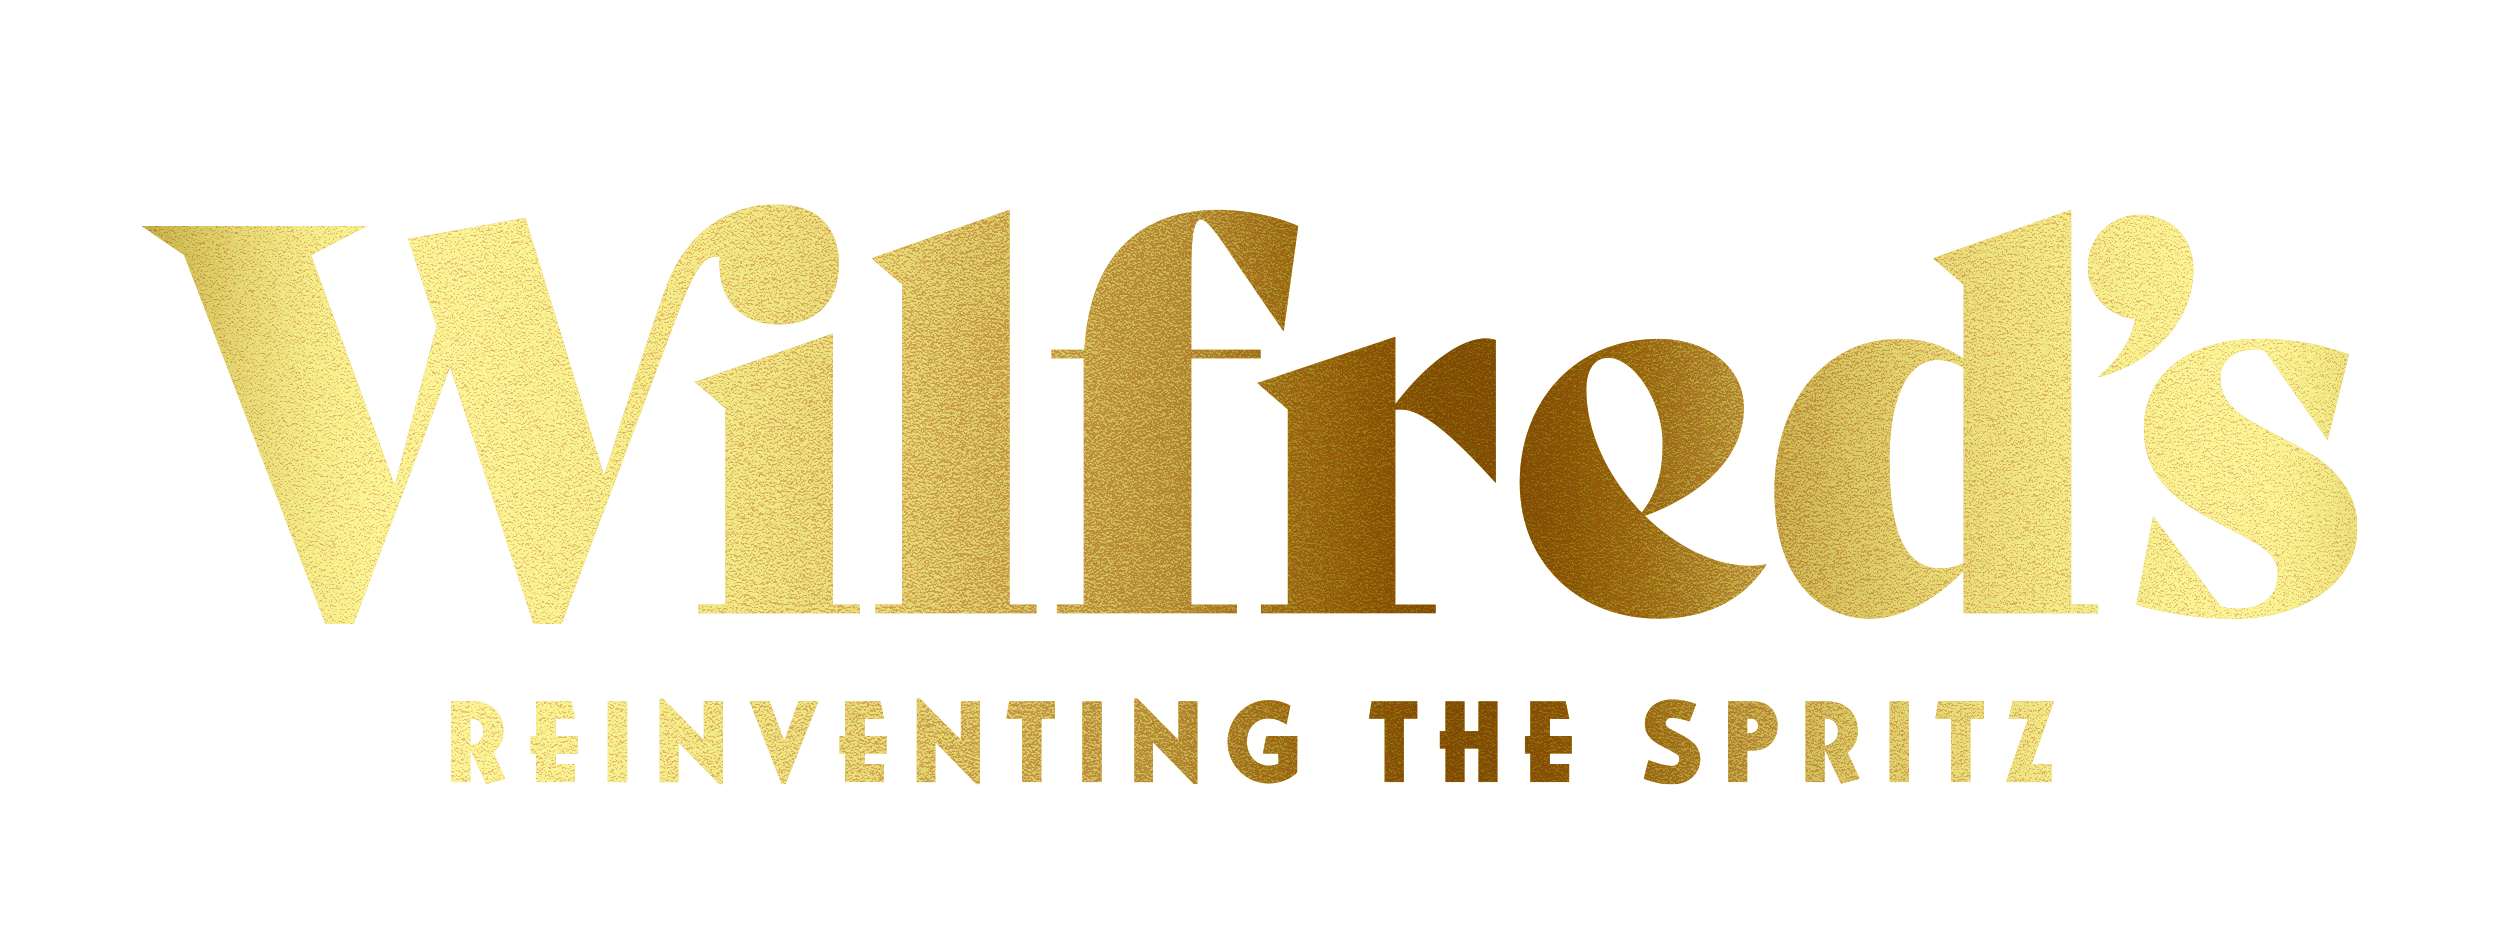 Wilfreds Logo